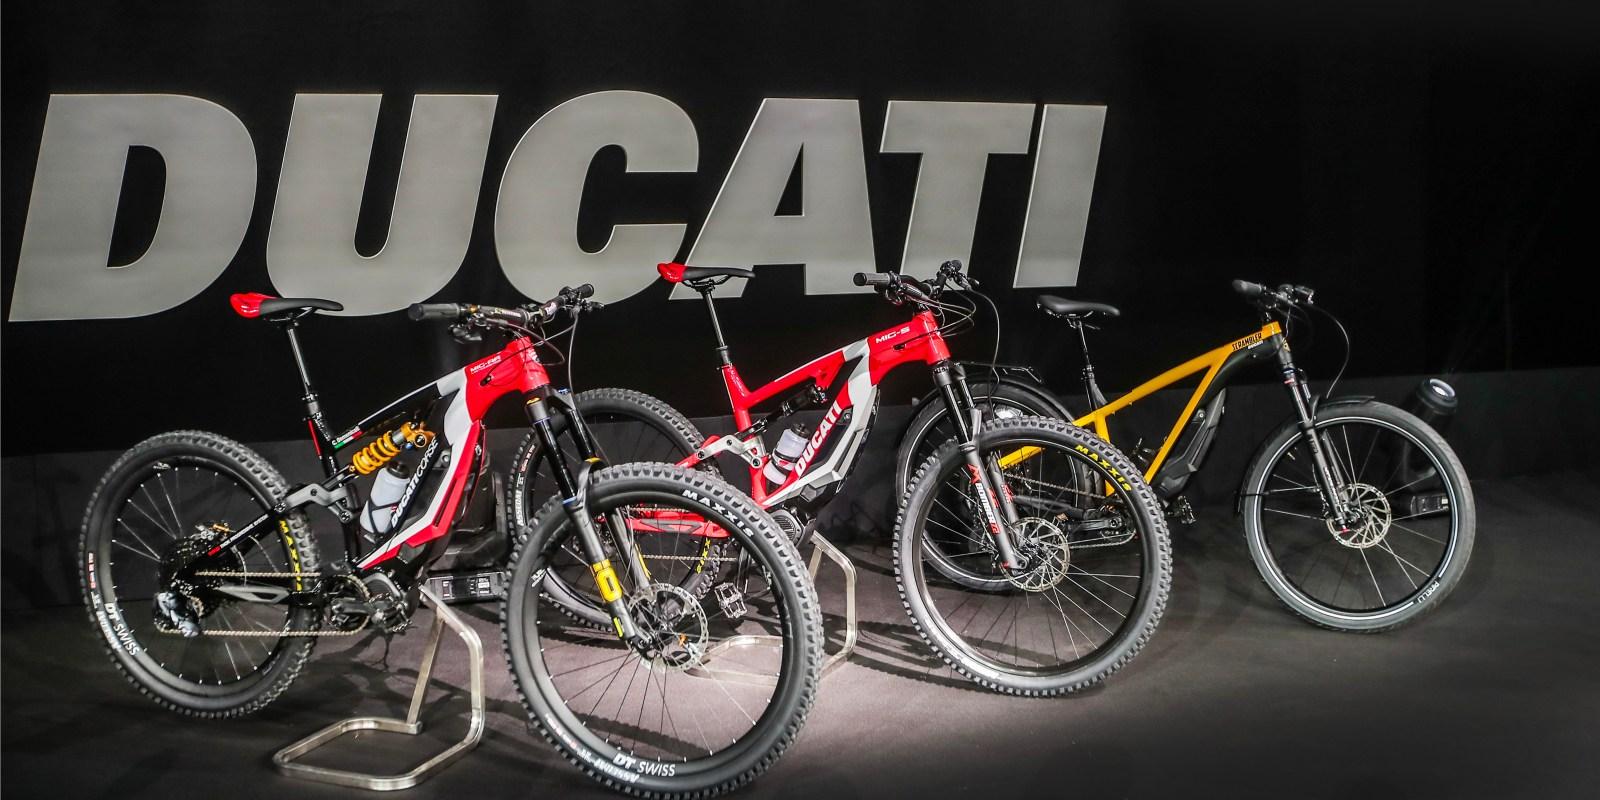 ducati electric bicycles